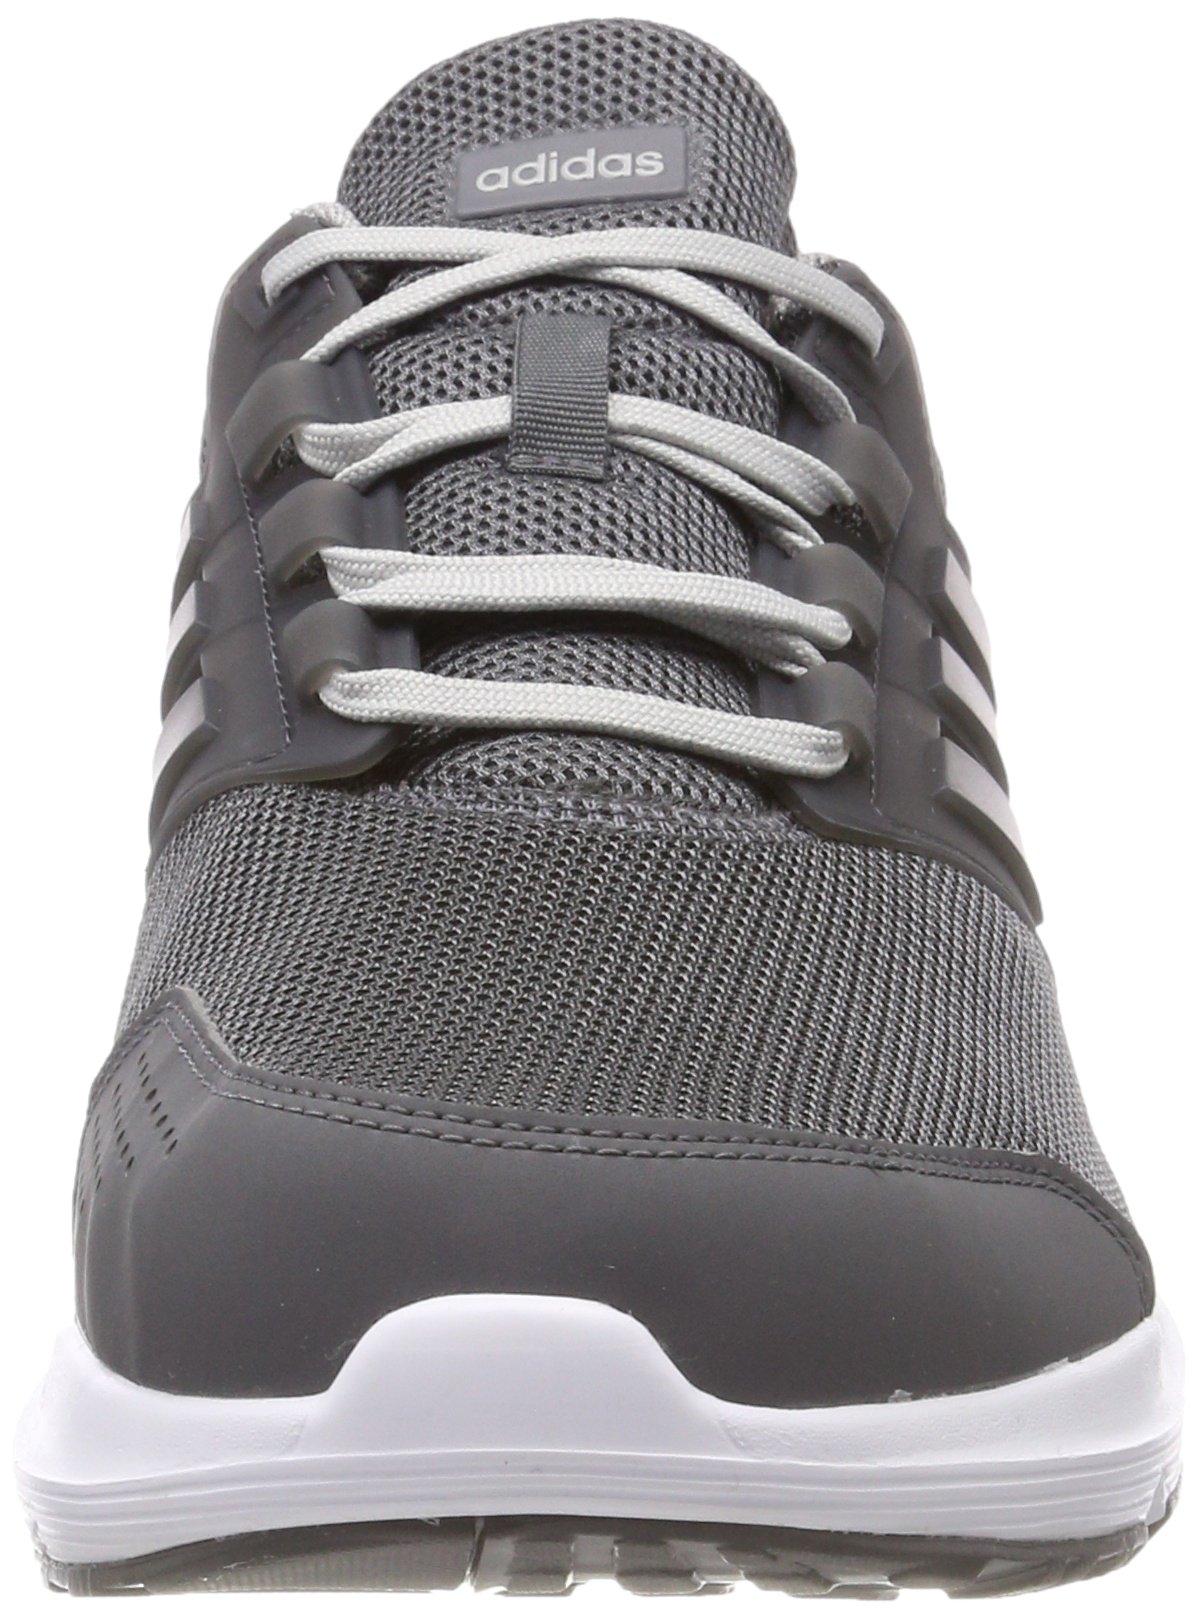 check out 2b4d1 a1a5e Adidas Galaxy 4, Scarpe da Running Uomo – Spesavip